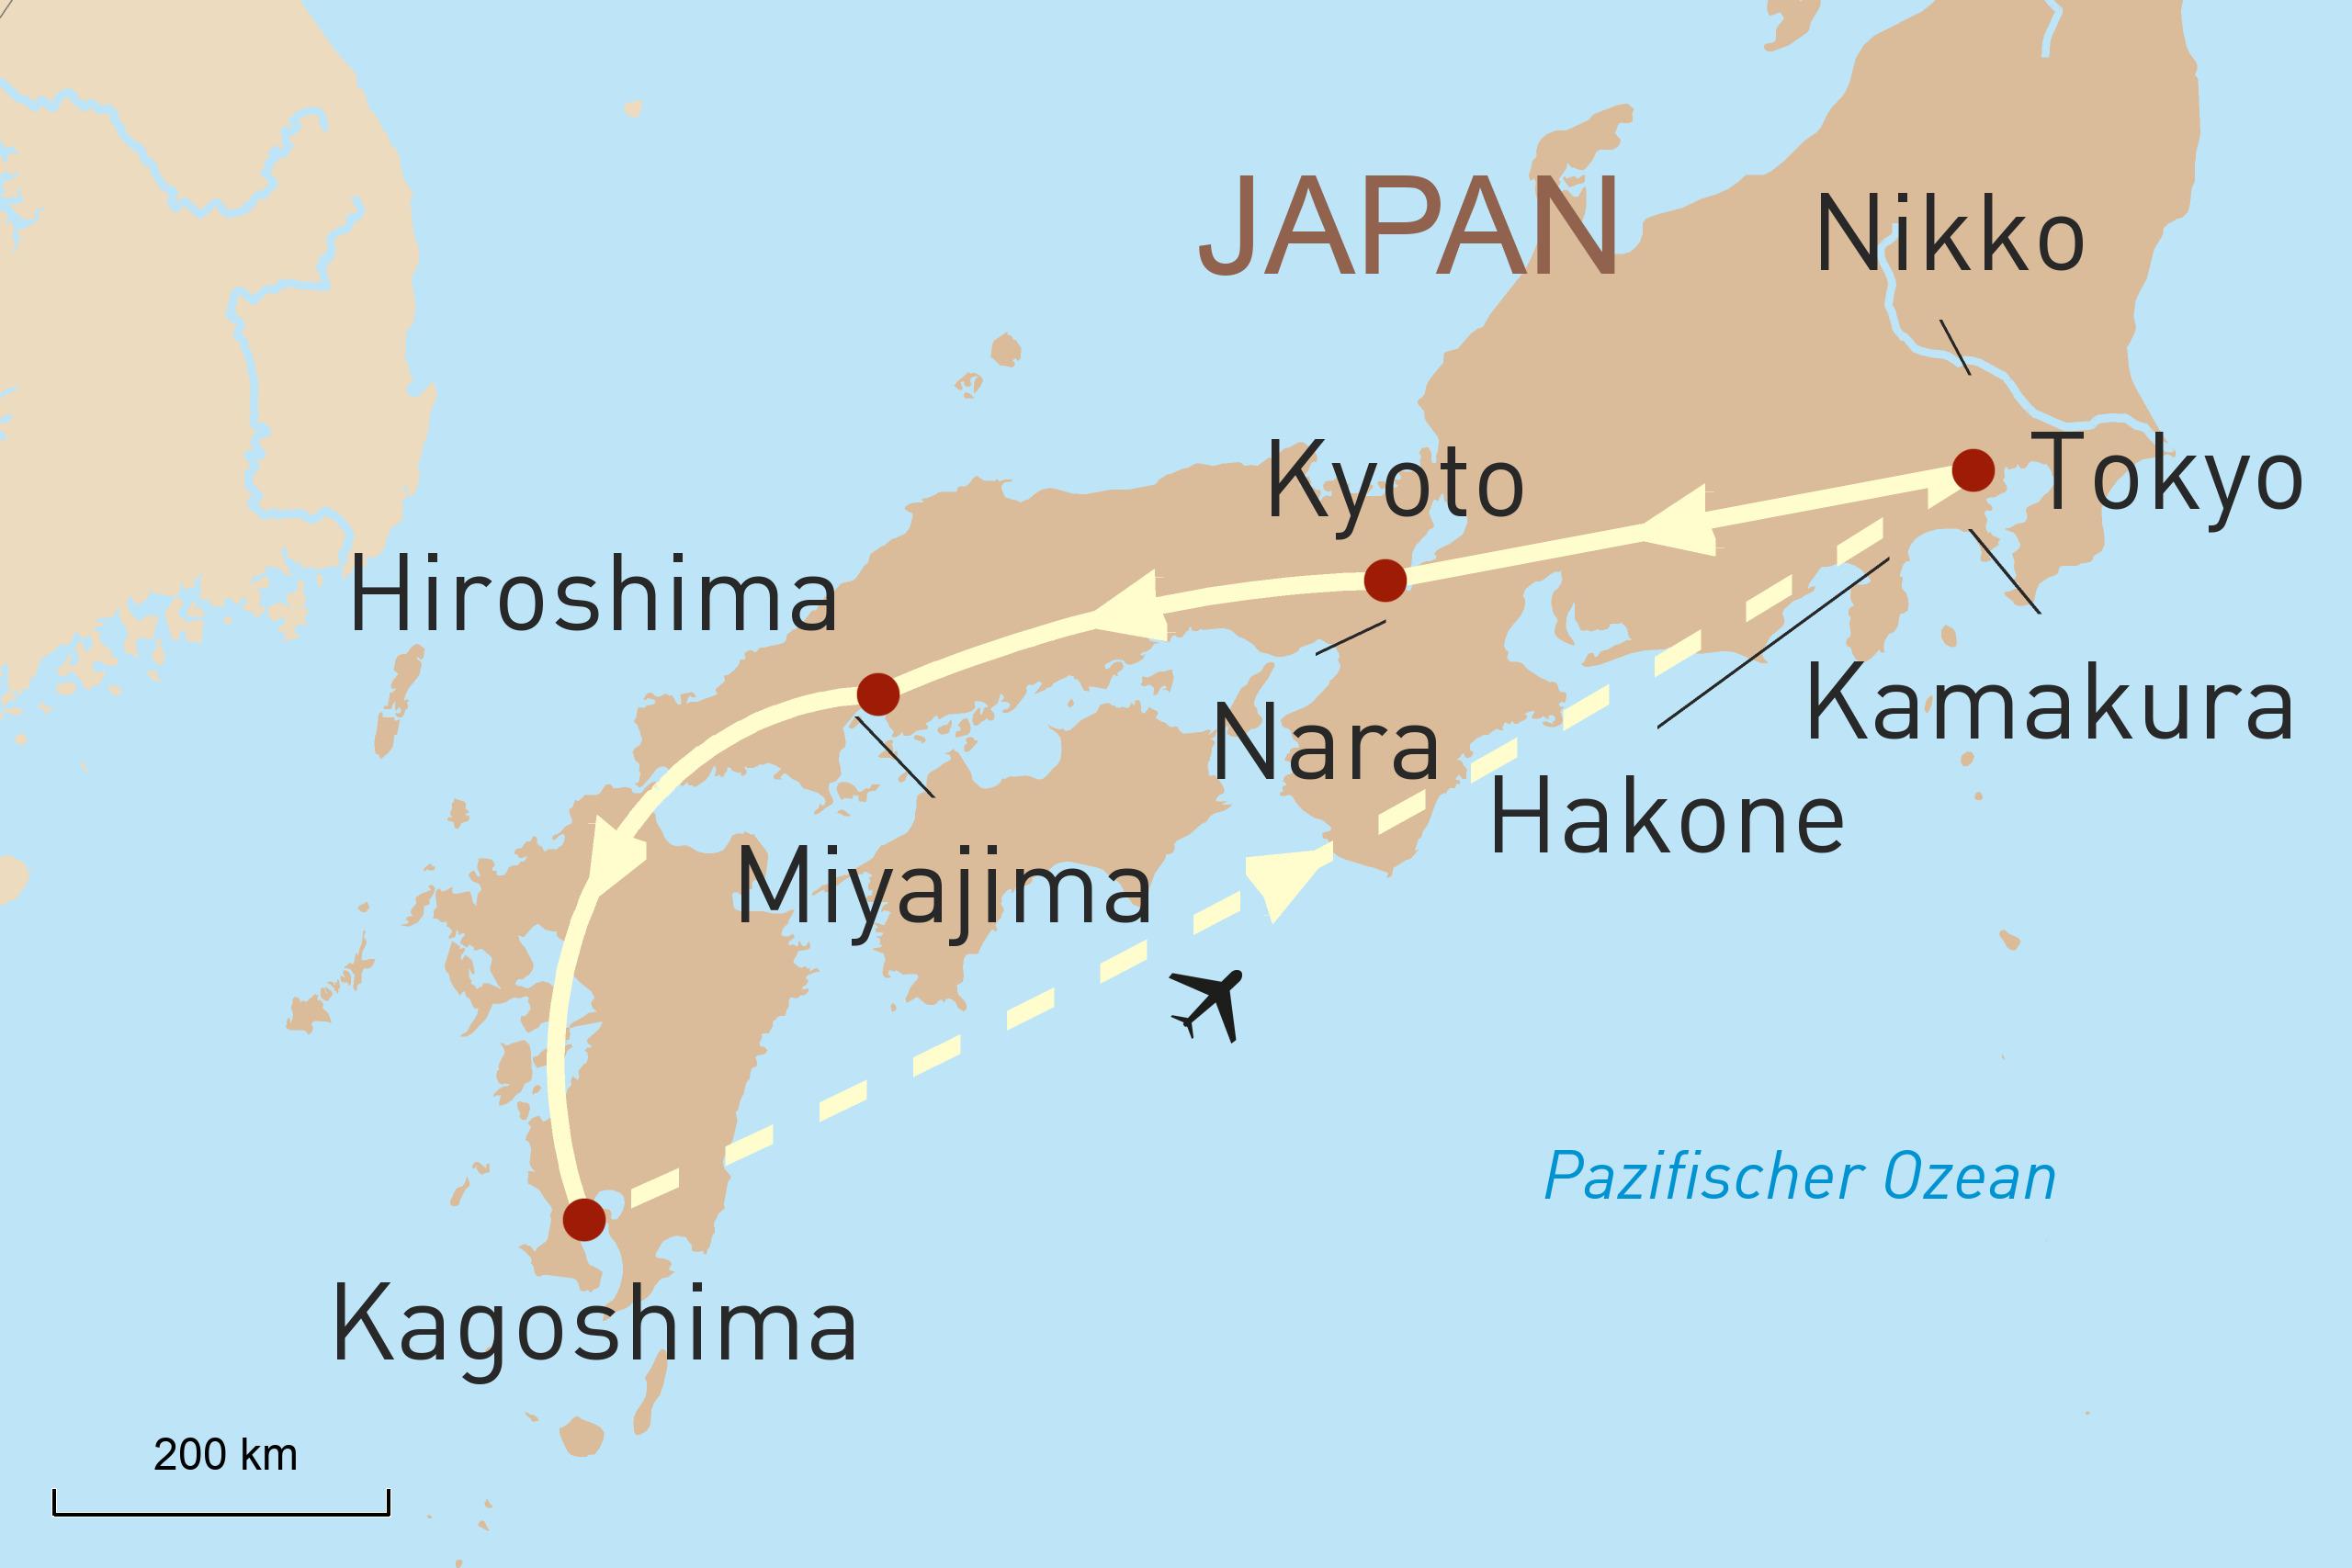 Japan exklusiv